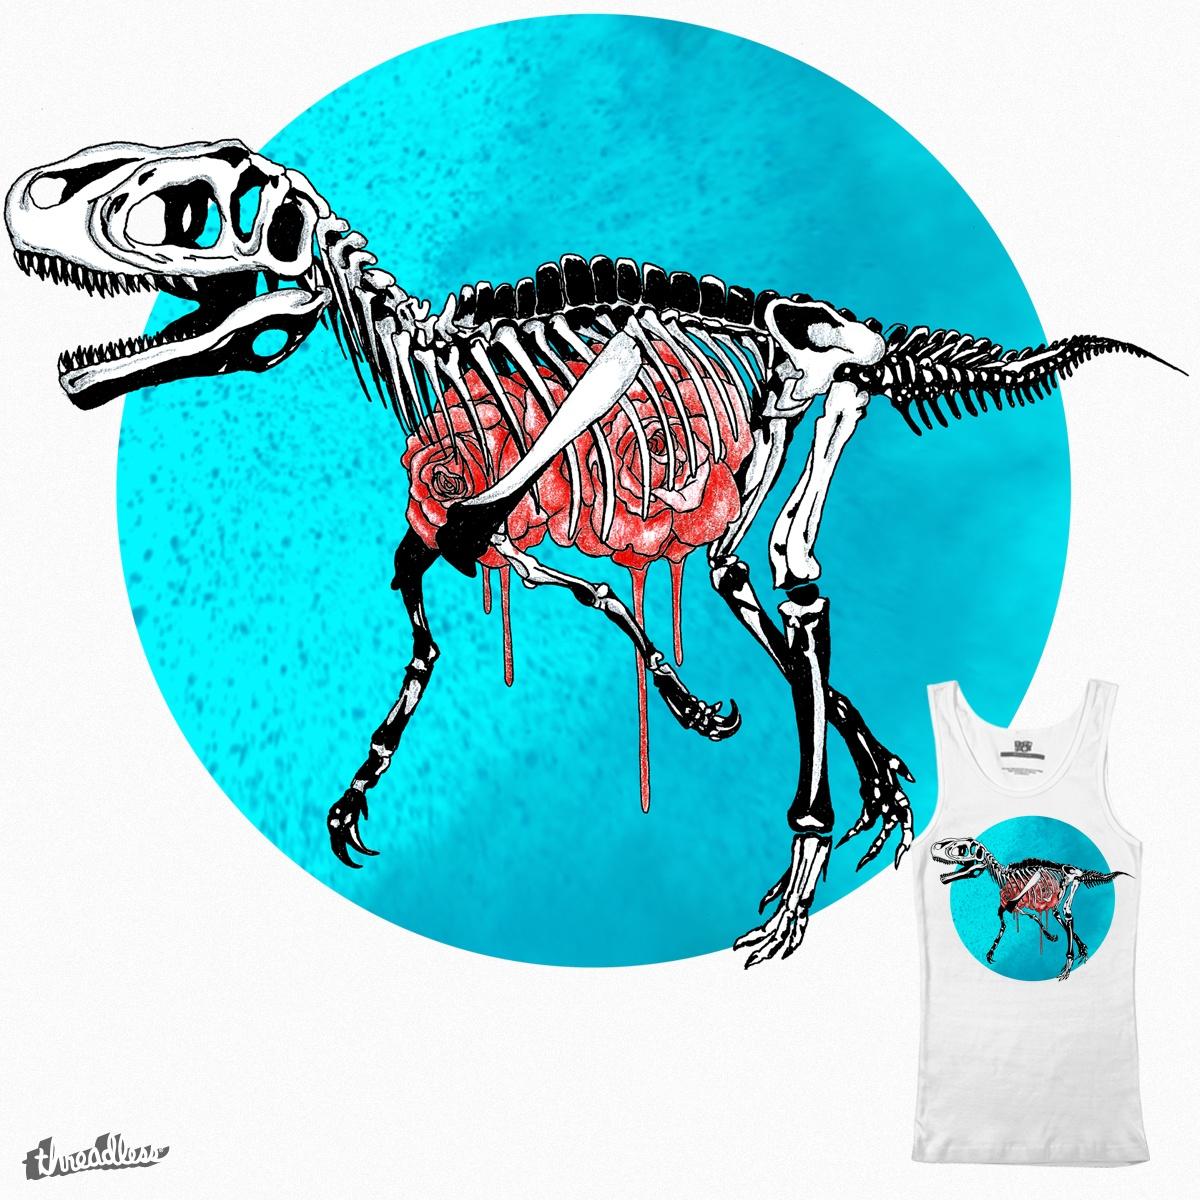 Dinosaur by AltidKaer on Threadless